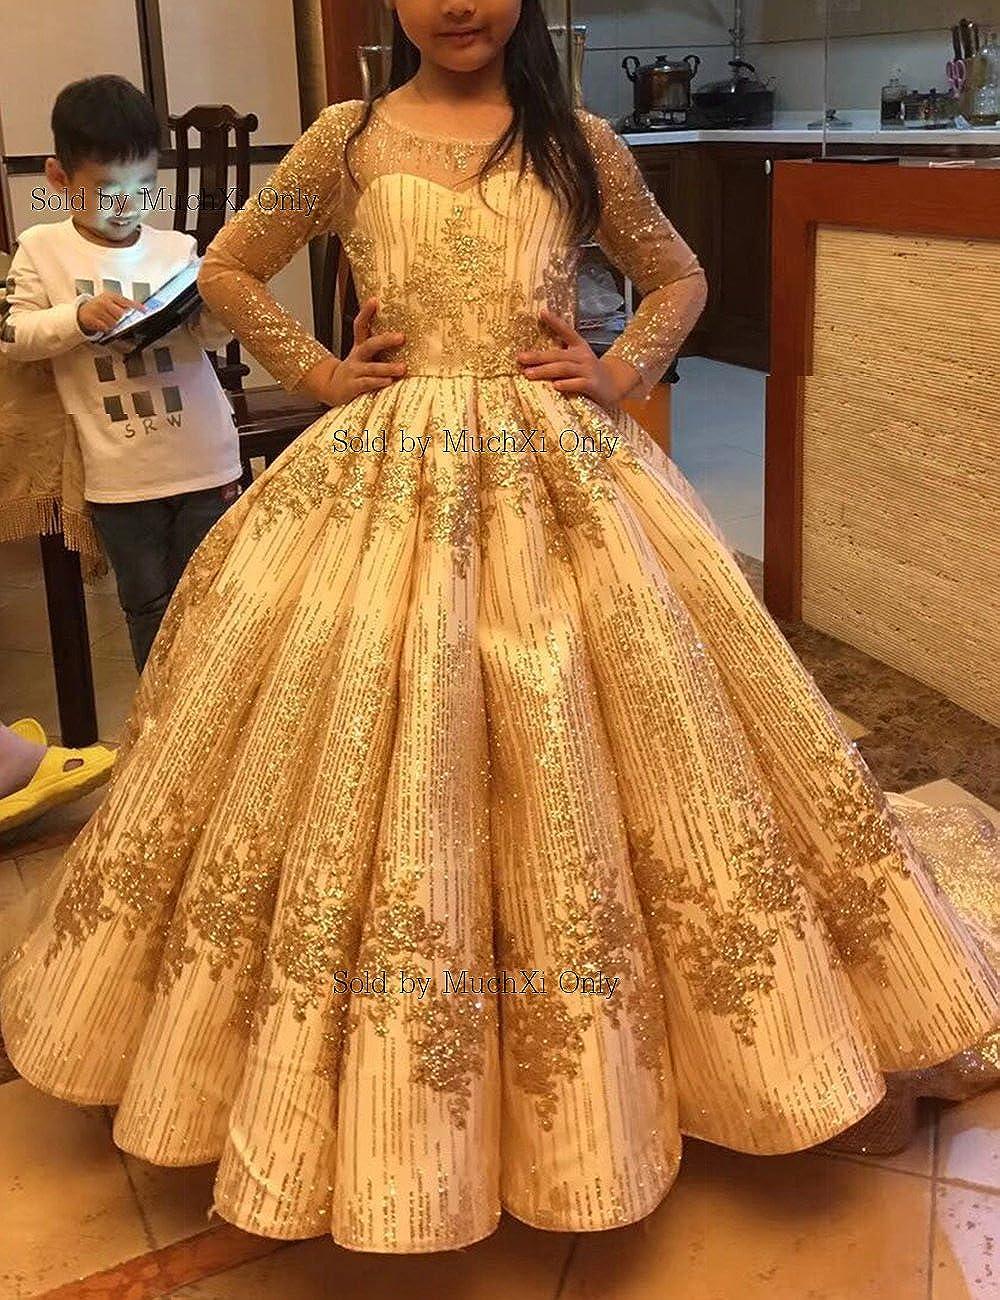 3f163dd66c4db Amazon.com  MuchXi A-Line Girl s Chiffon Lace V-Neck Pageant Wedding Party  Bridesmaid Flower Girl Dress  Clothing